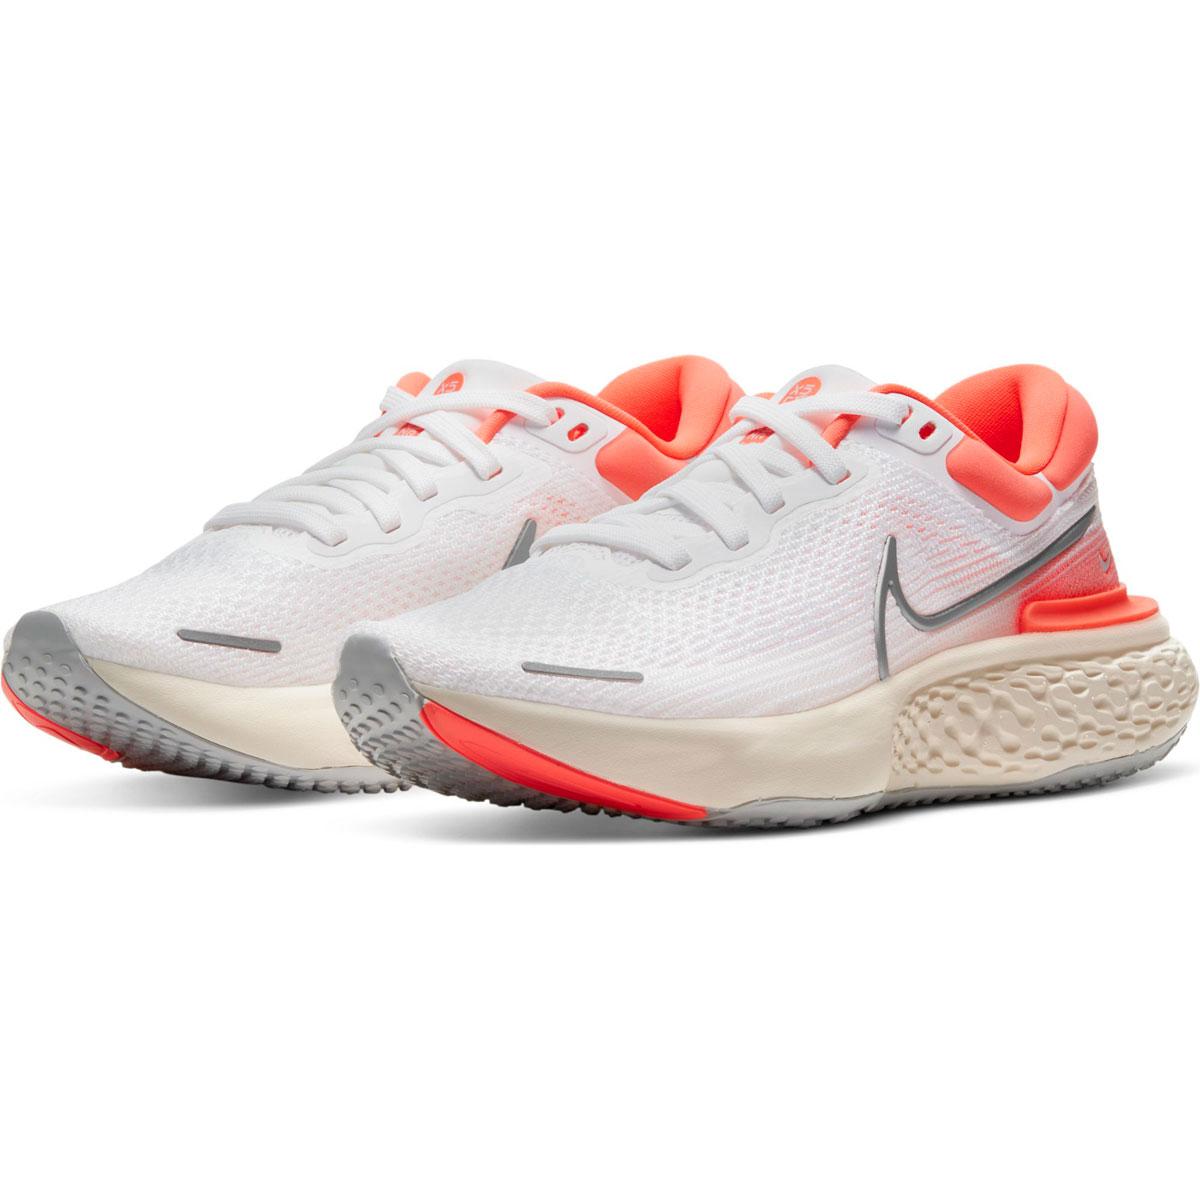 Women's Nike Zoomx Invincible Run FlyKnit Running Shoe - Color: White/Metallic Silver/Bright Mango - Size: 5 - Width: Regular, White/Metallic Silver/Bright Mango, large, image 5